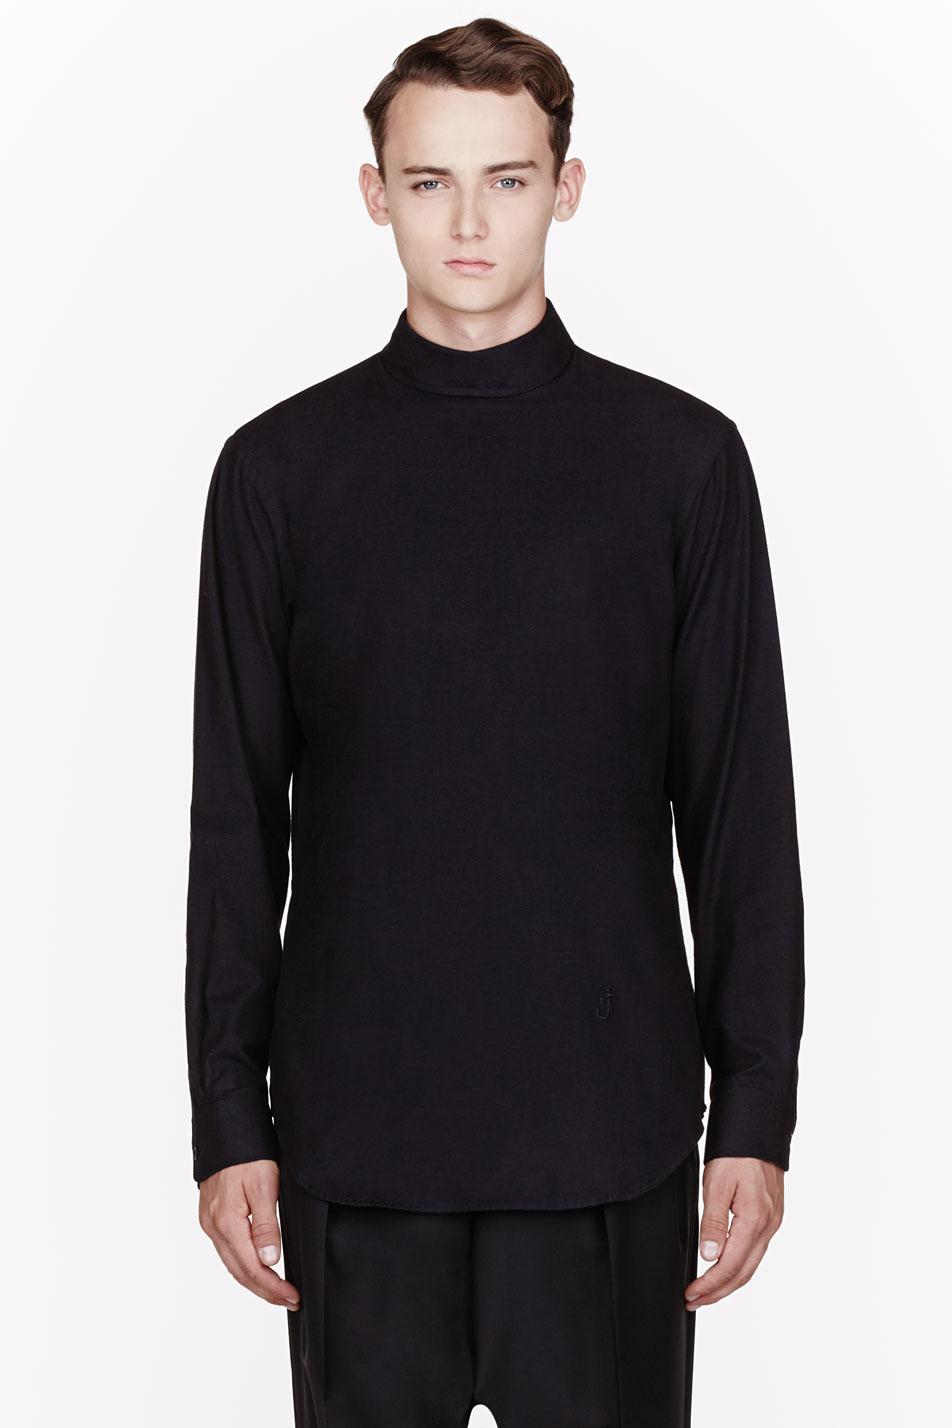 Lyst J W Anderson Black Priest Collar Shirt In Black For Men